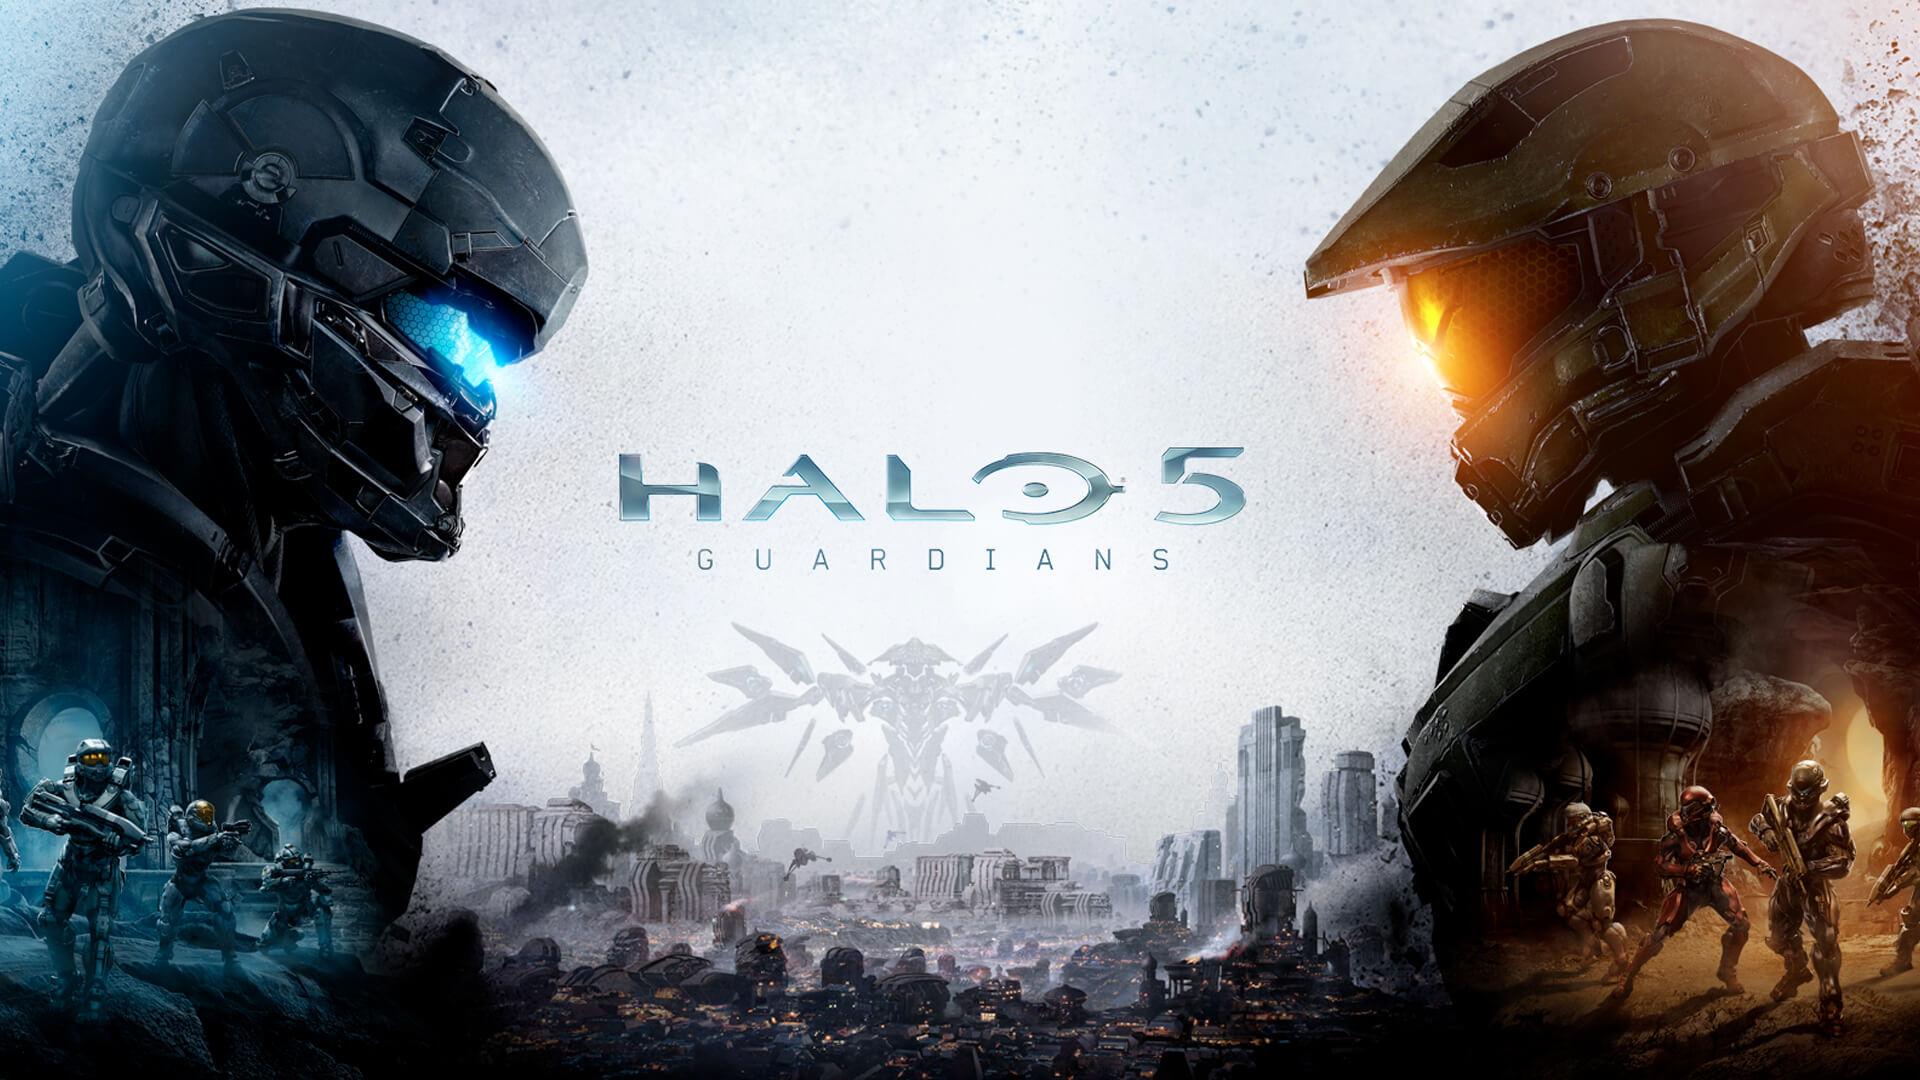 Despite The Xbox Ad Teasing Halo 5 Split-Screen, It Won't Be